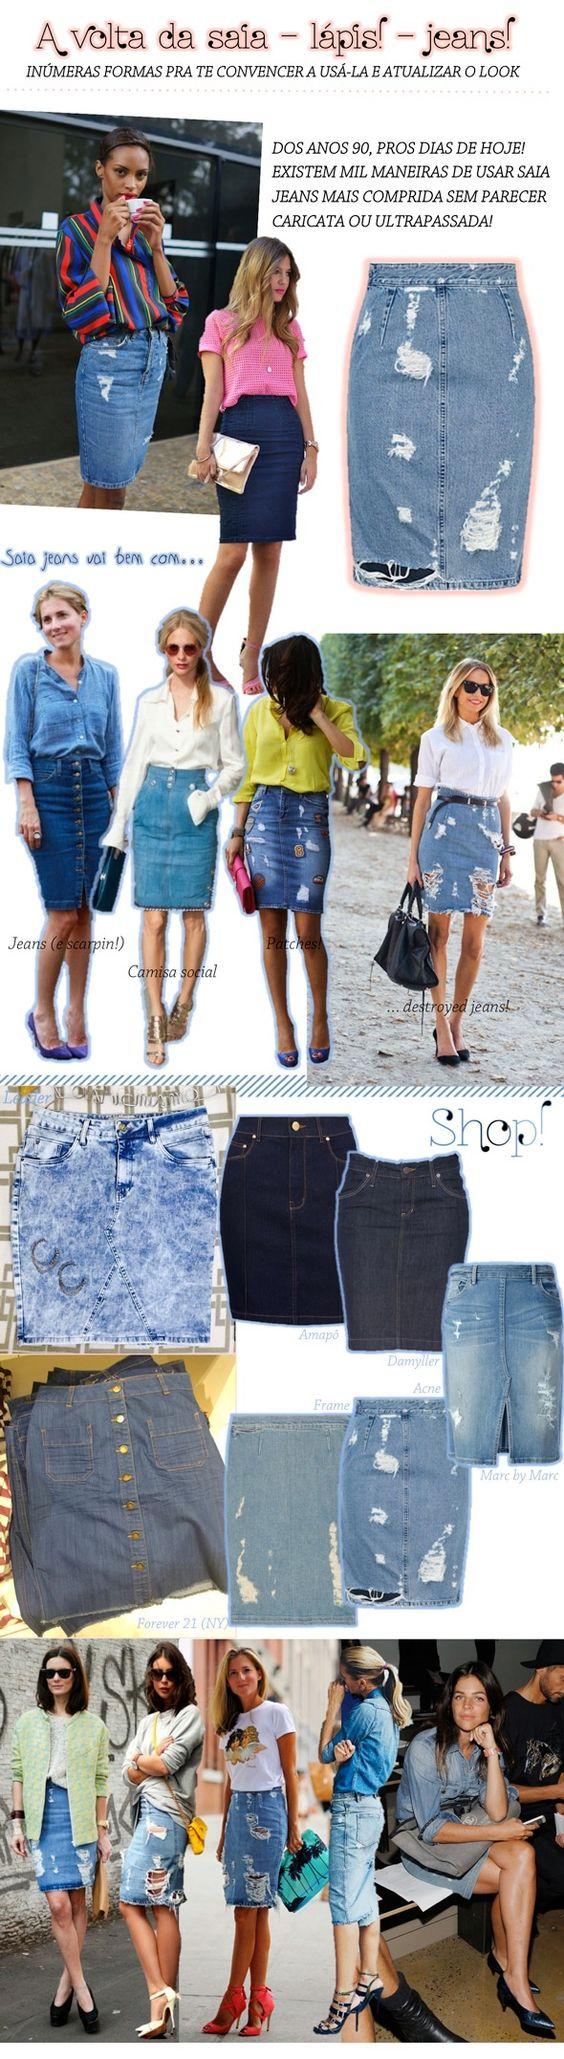 A saia – lápis – jeans da discórdia!: